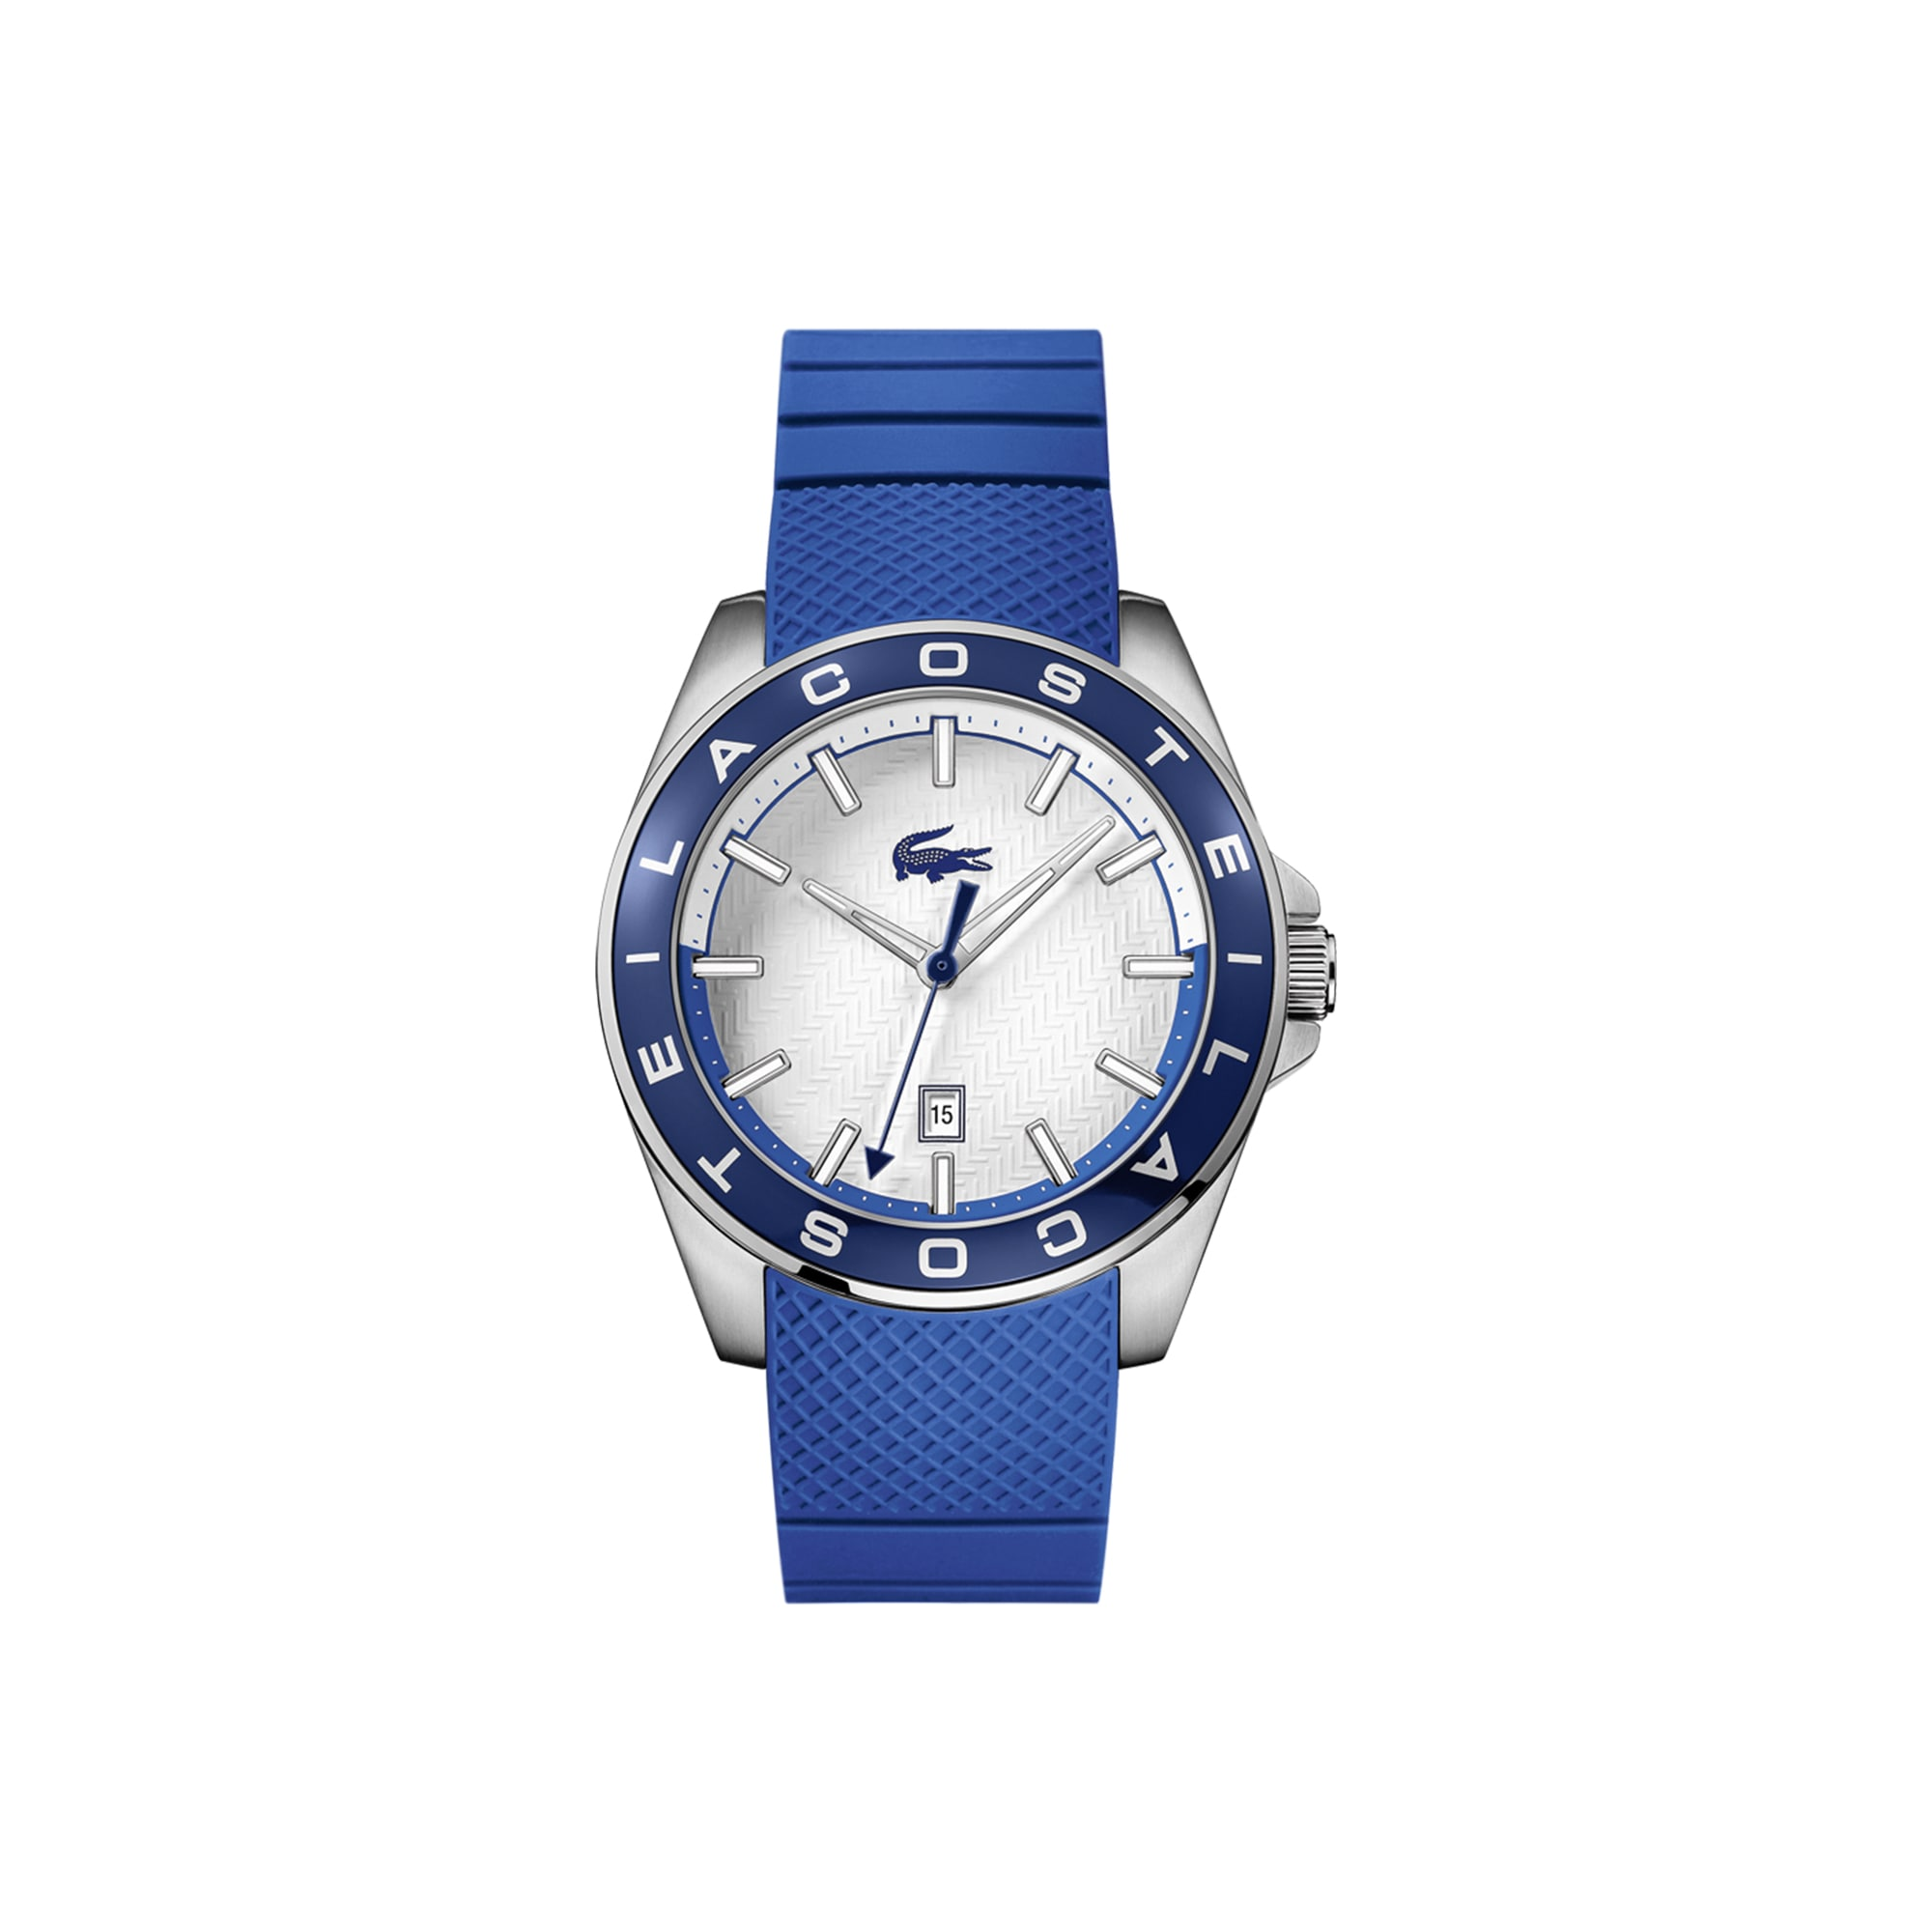 Orologio Westport Uomo con Cinturino in Silicone Blu